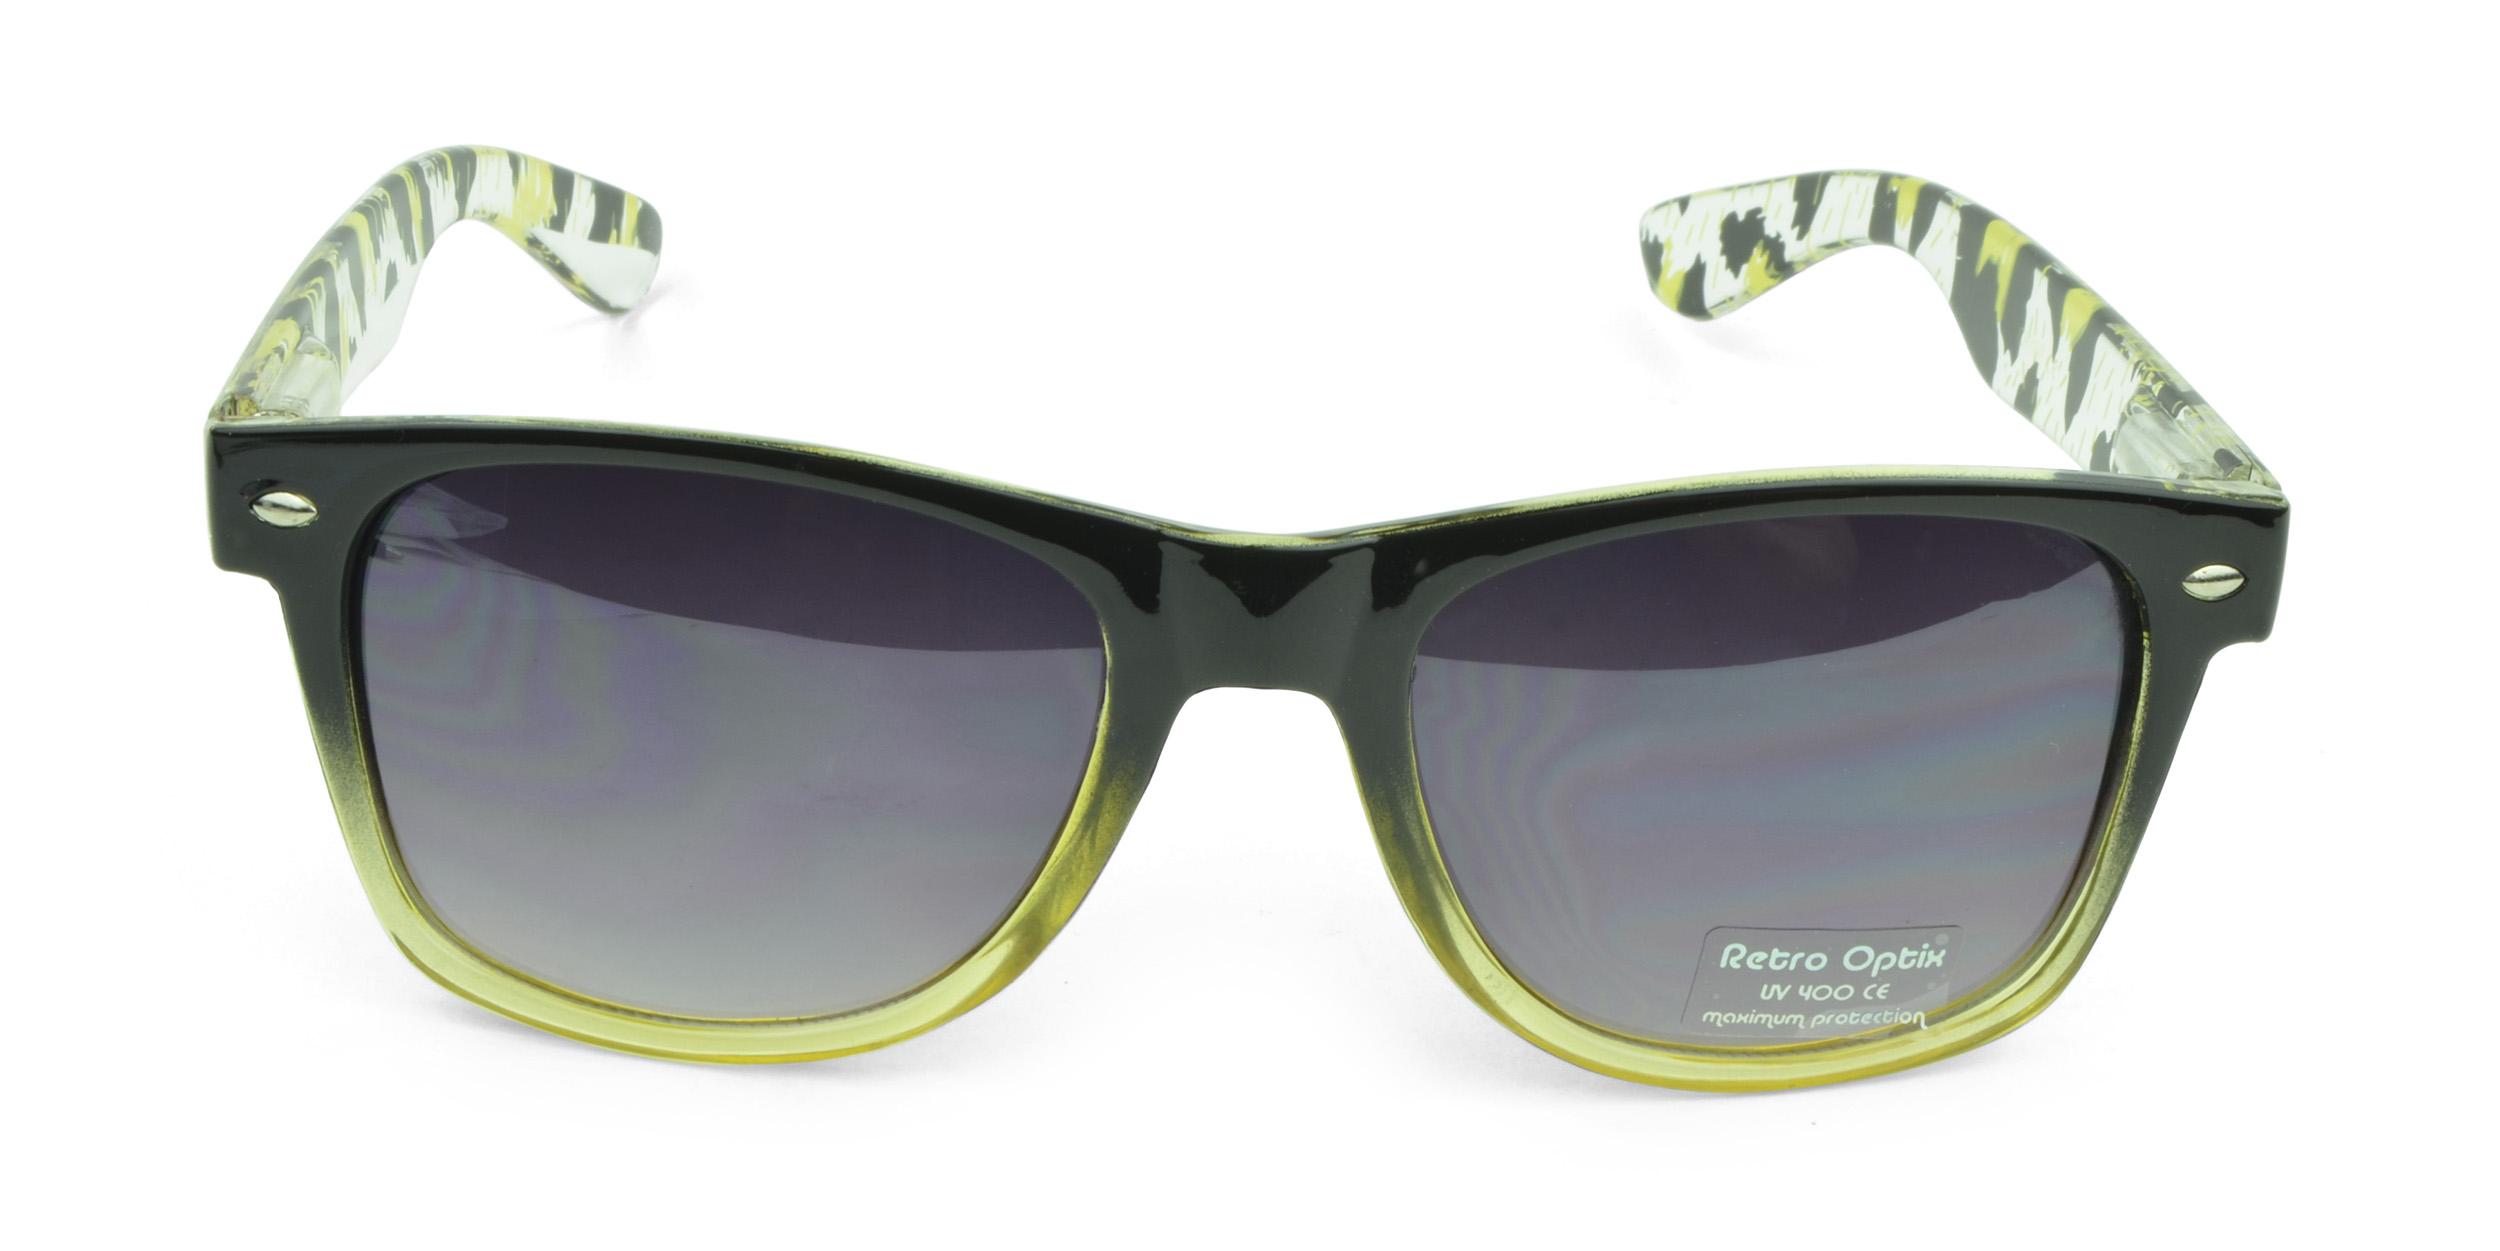 Belle Donne - Wayfarer Style Sunglasses Trendy Cheap Sunglasses High Quality Animal Print - Yellow